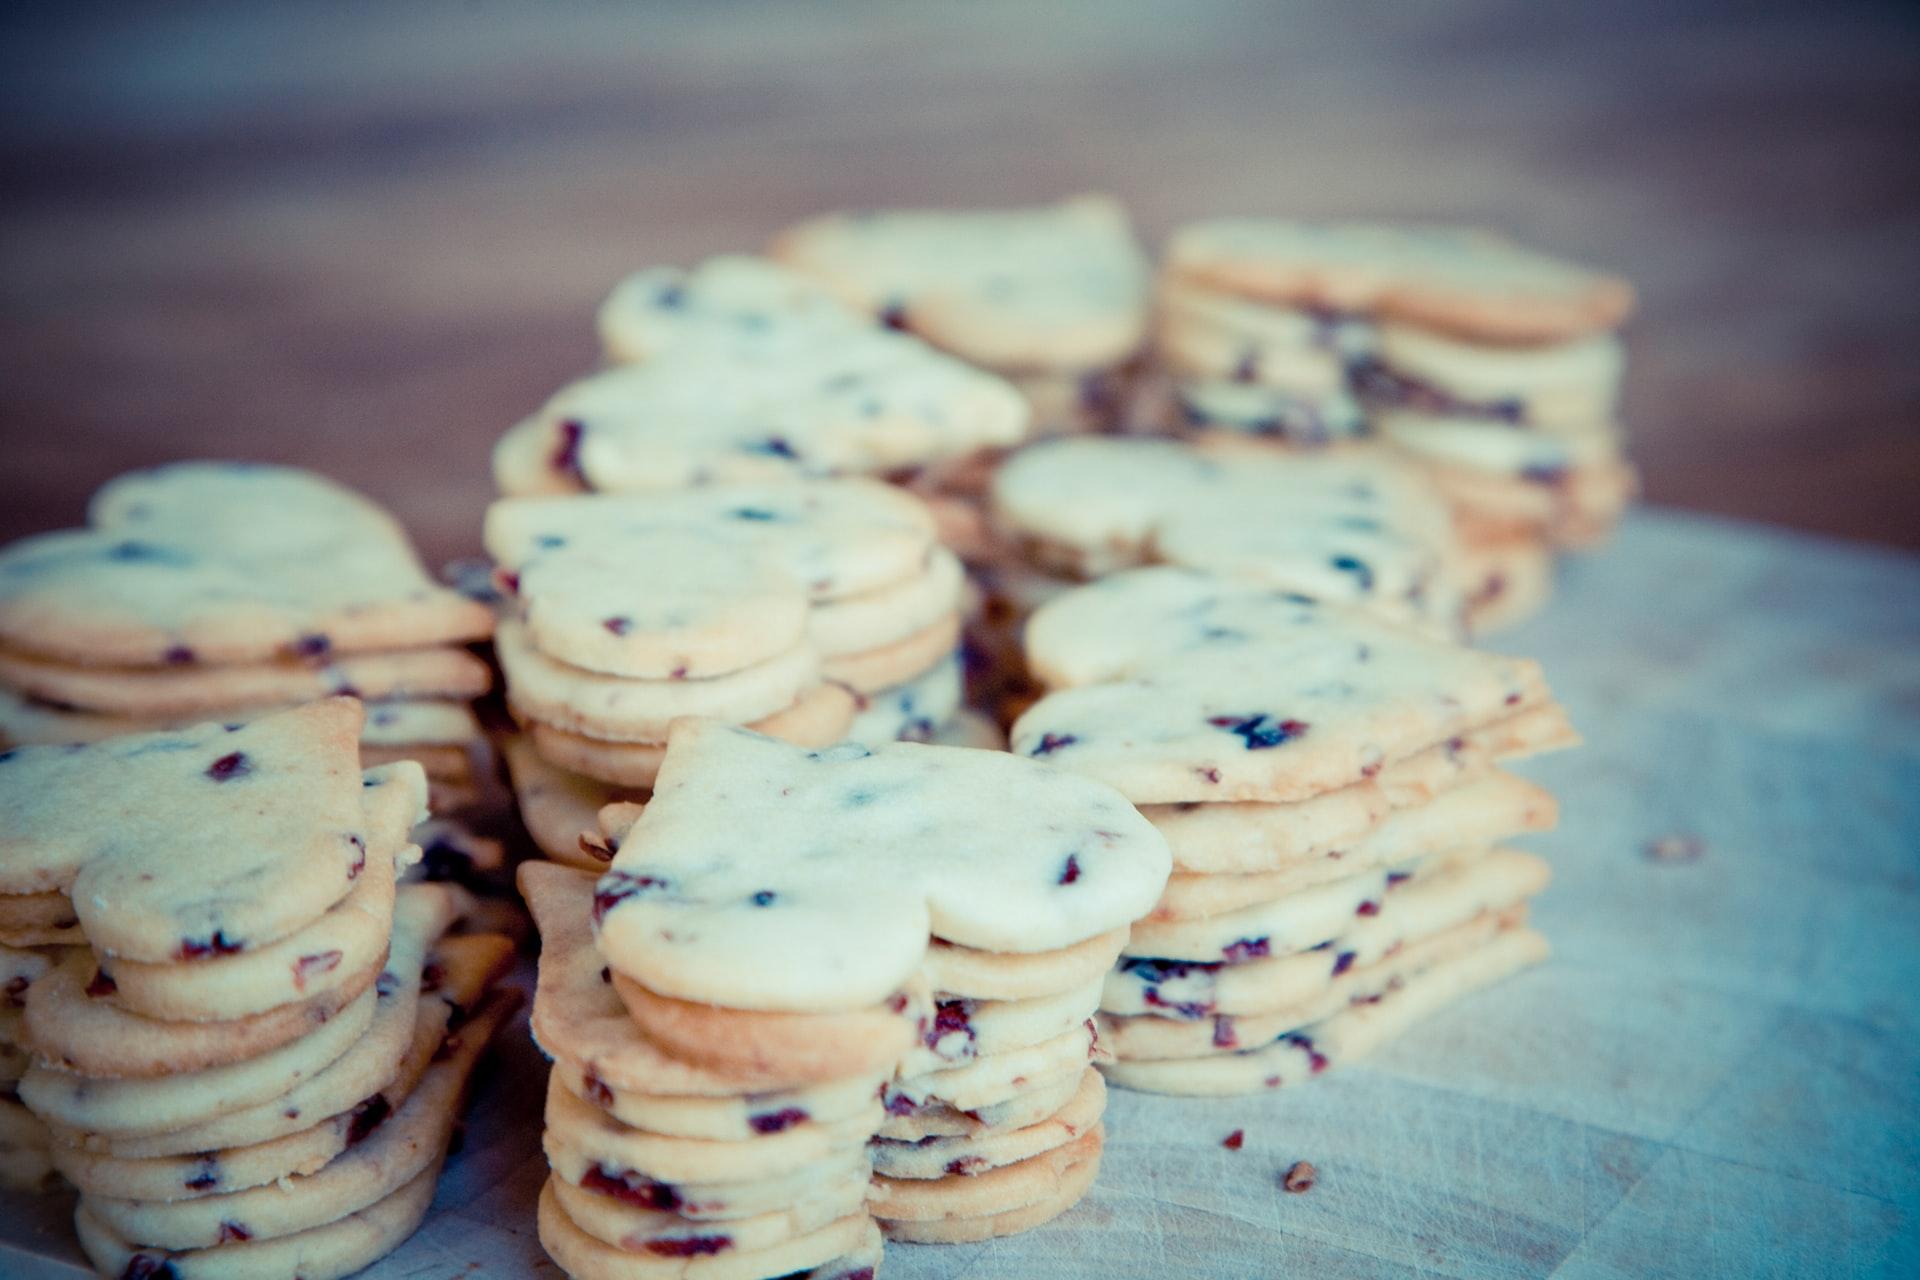 Des piles de cookies